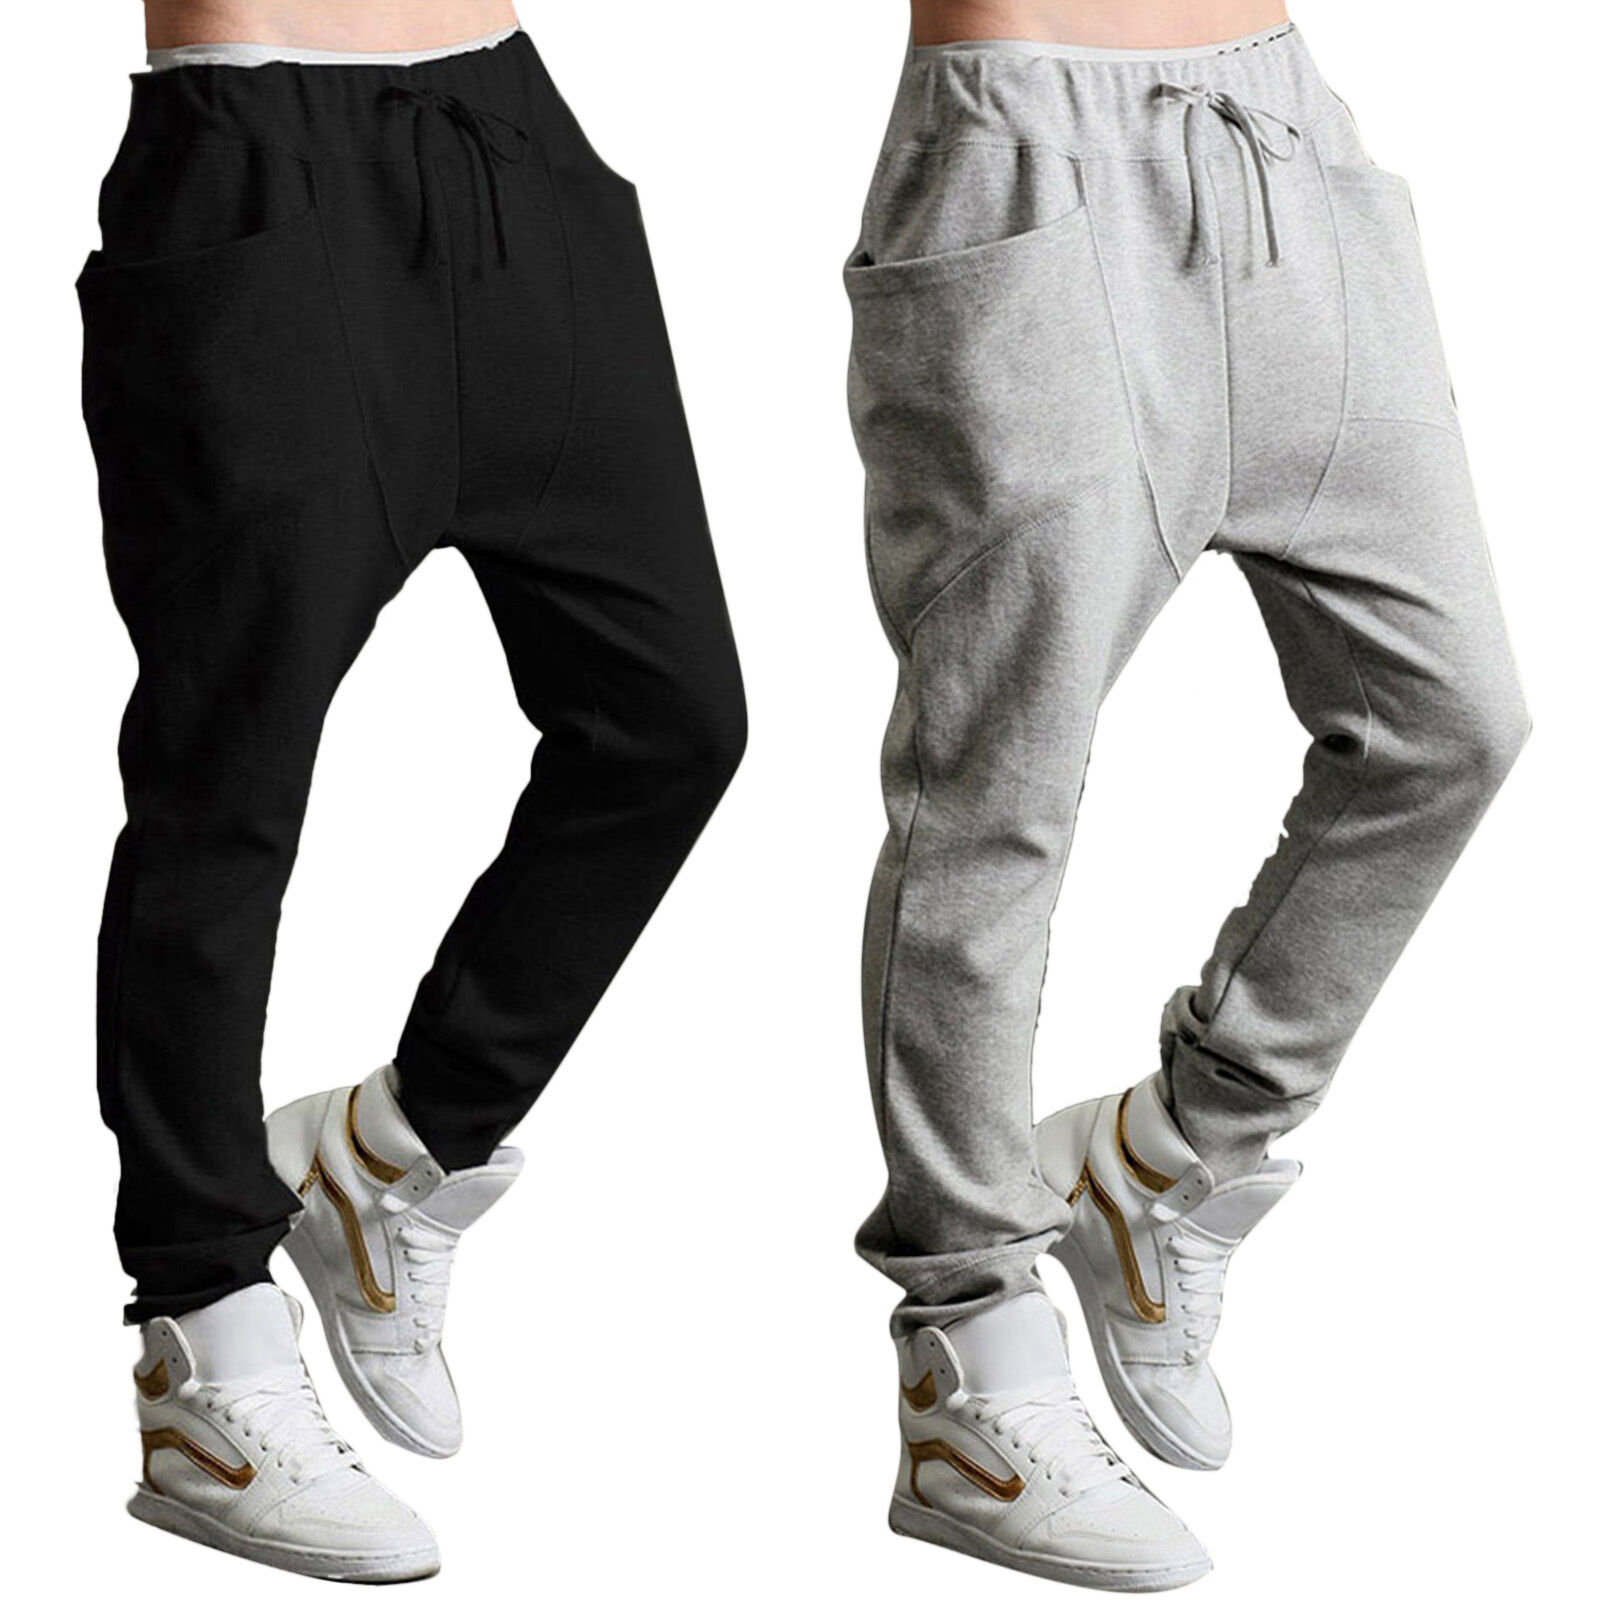 men sportswear jogger baggy harem pants slacks